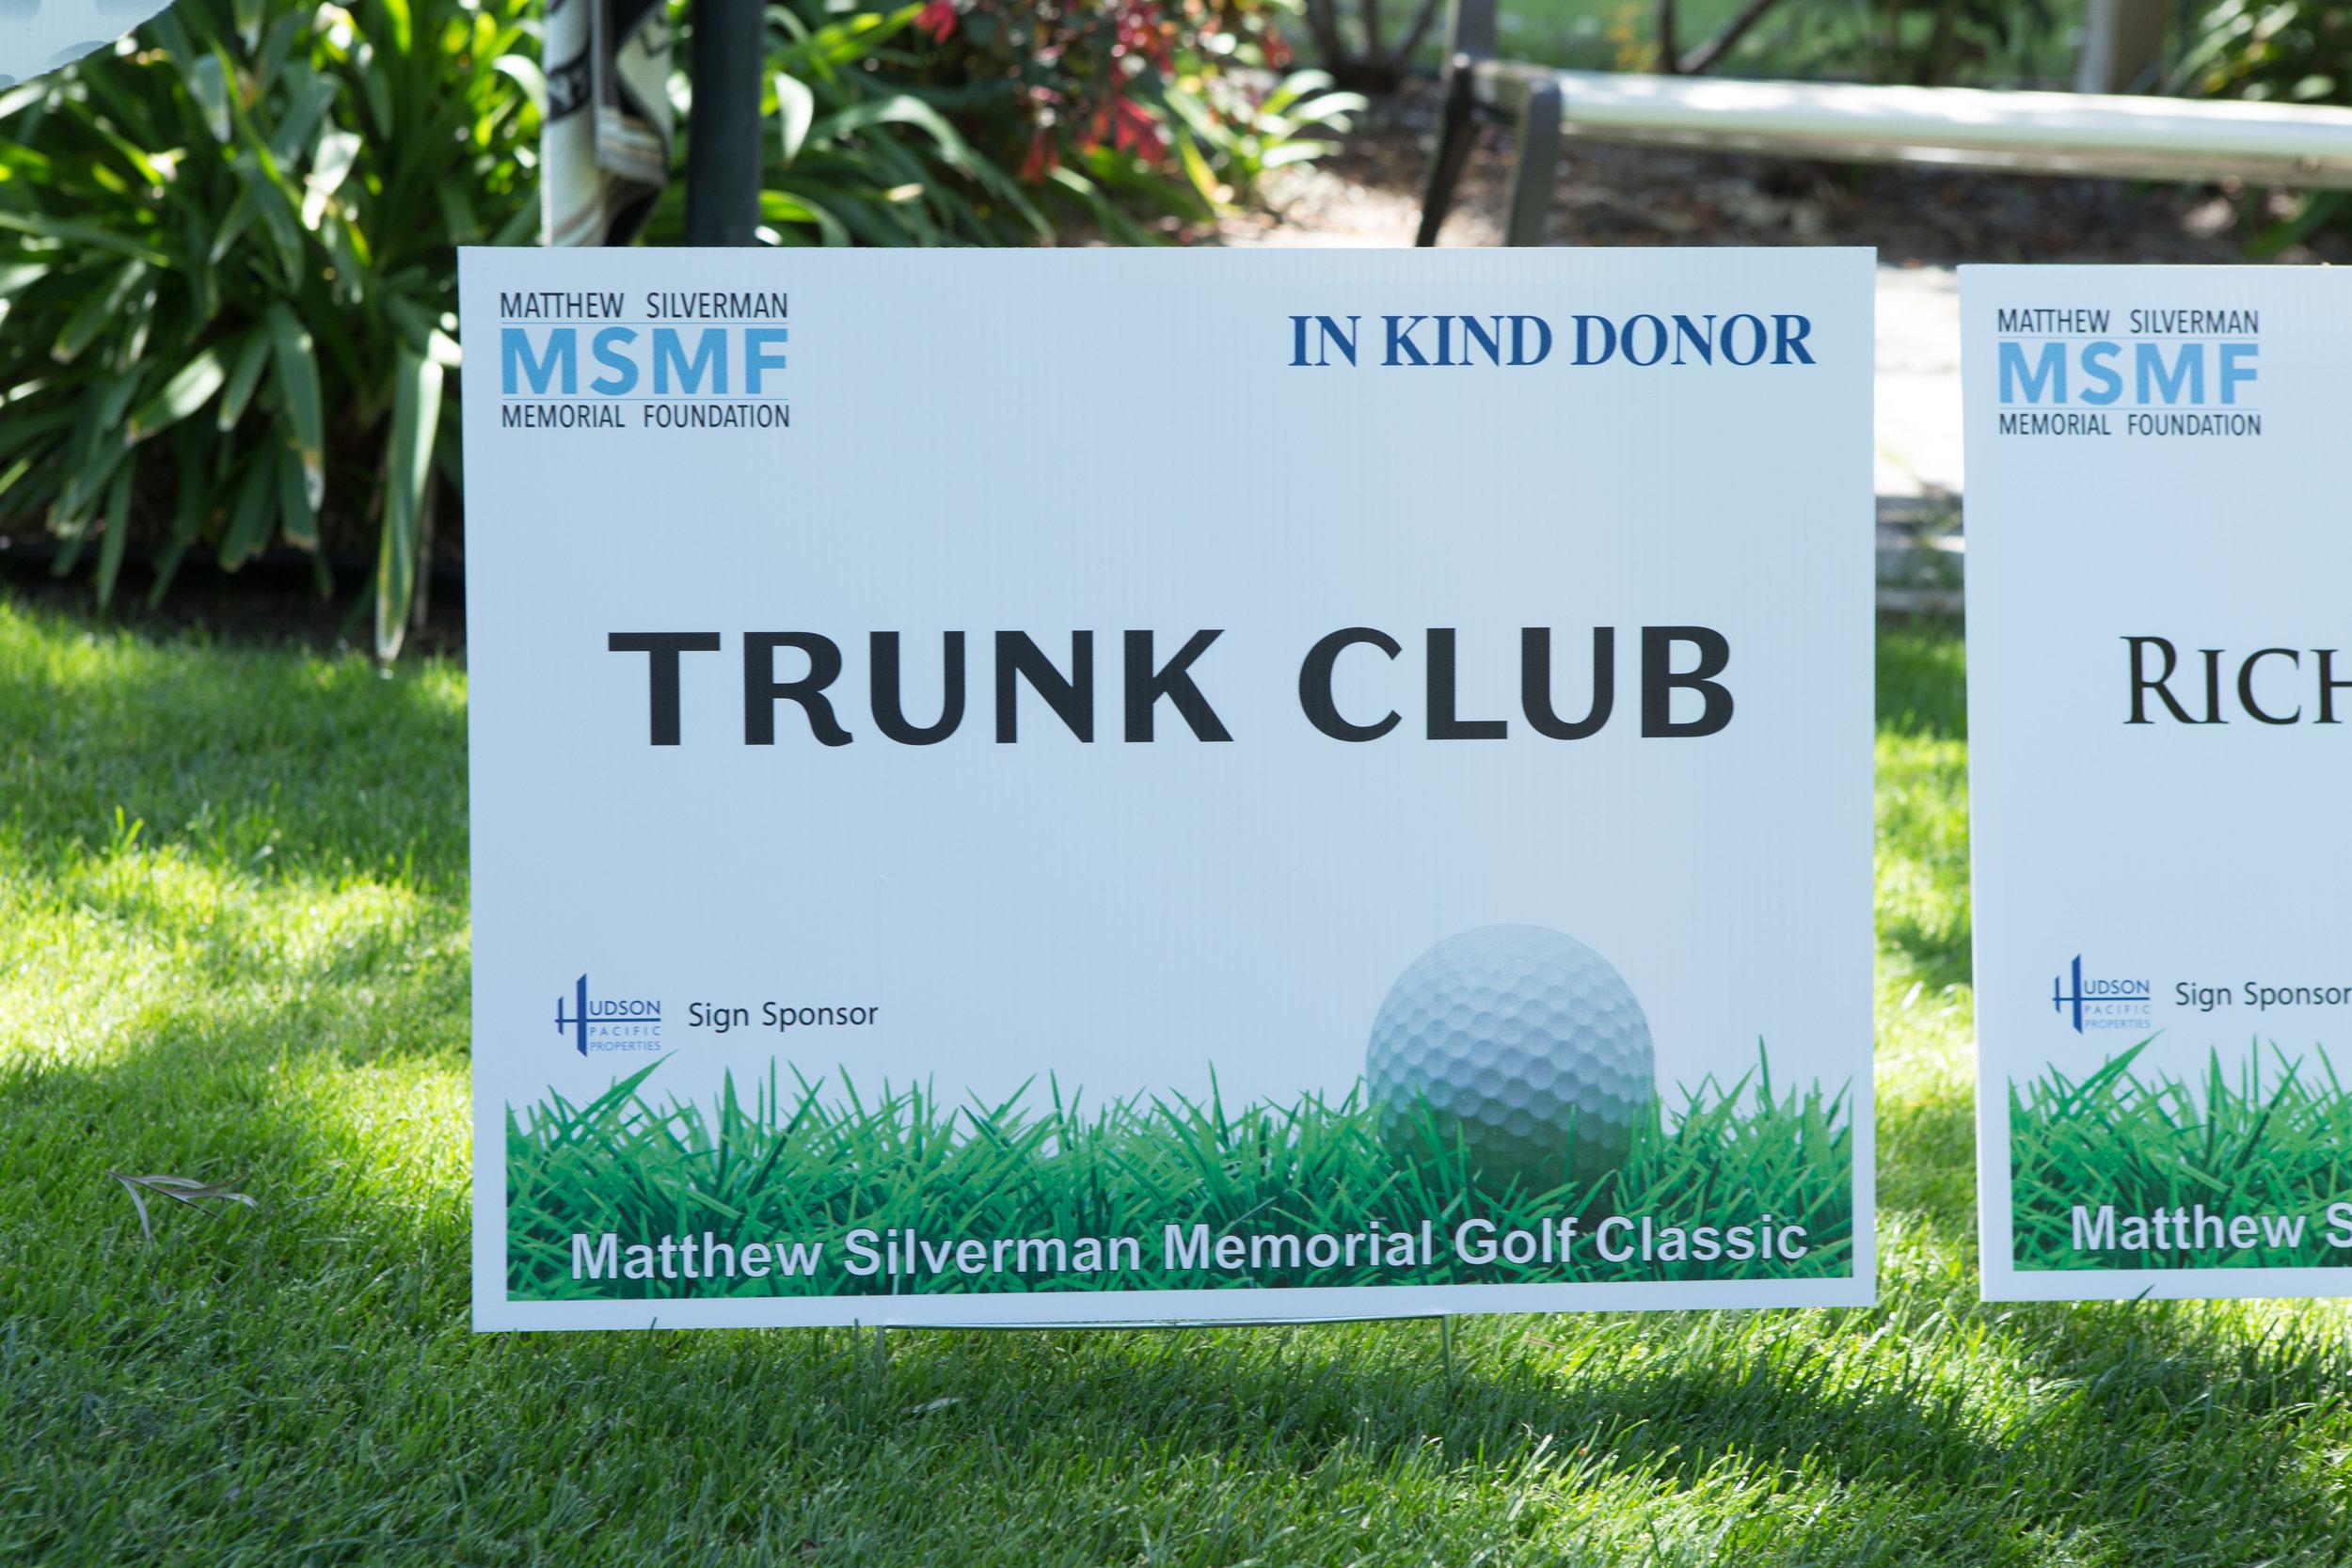 IMG_7905-SPONSOR SIGN-Trunk Club.jpg